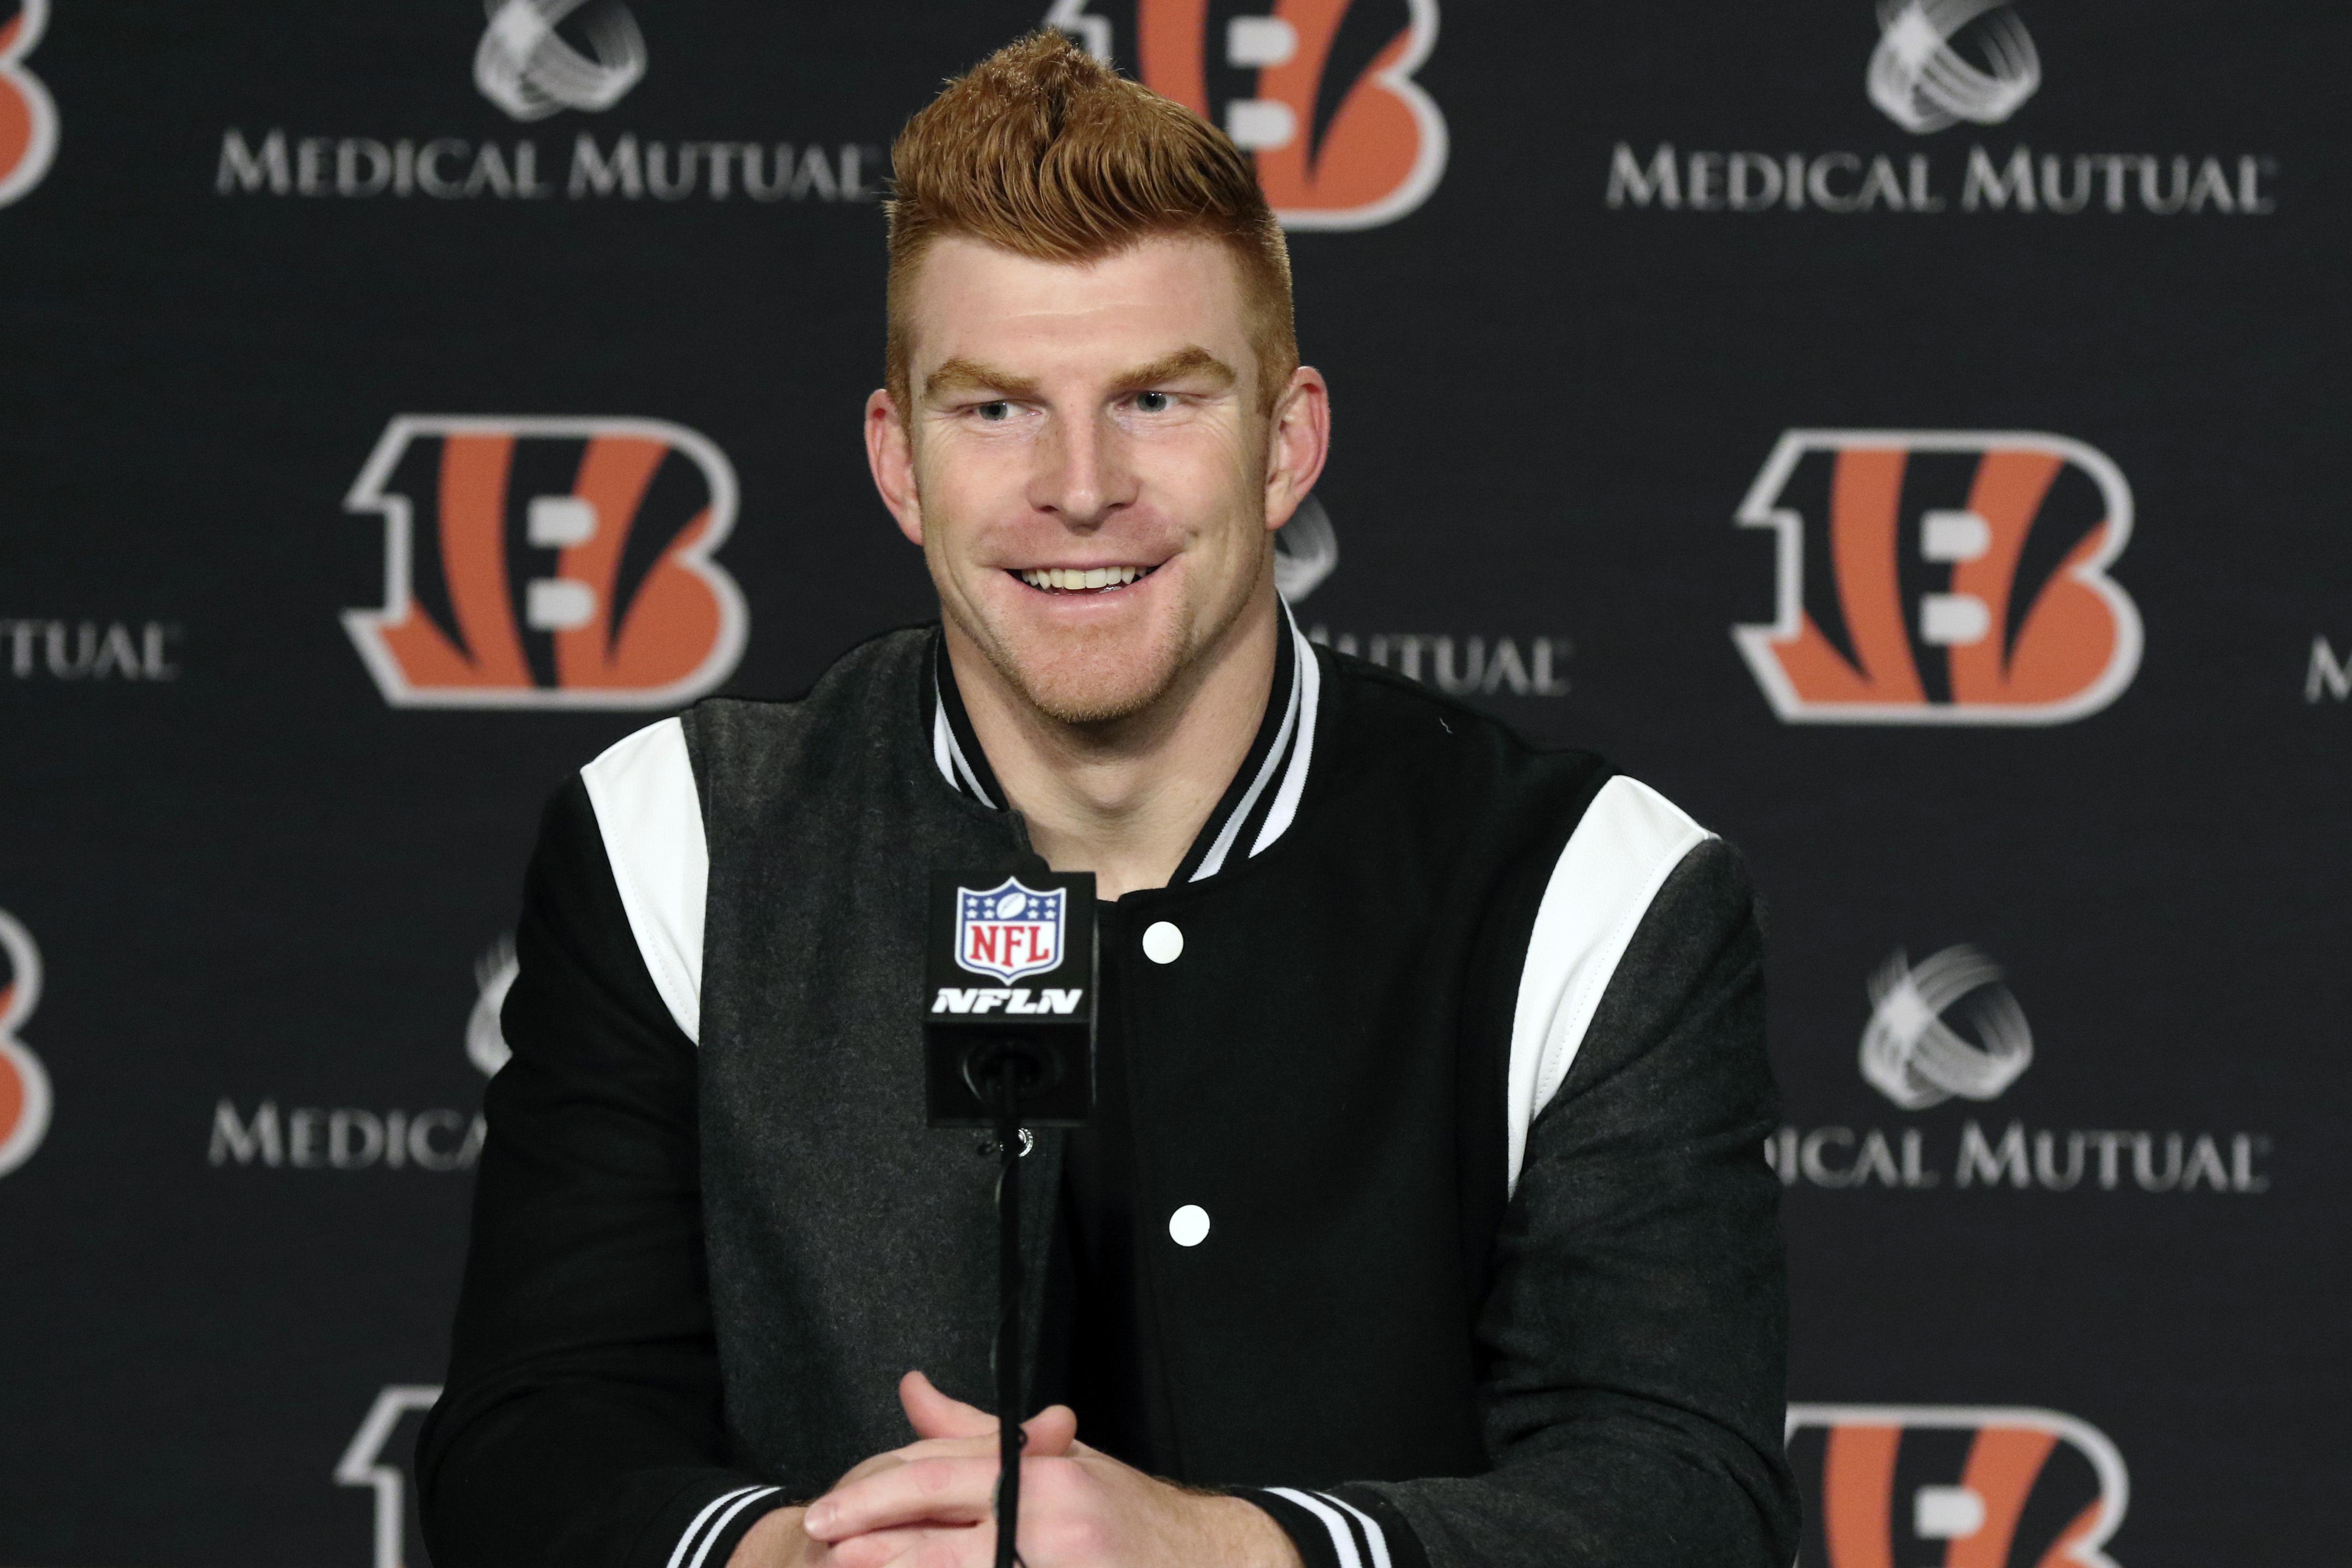 Cowboys sign Dalton, waive incumbent backup QB Cooper Rush